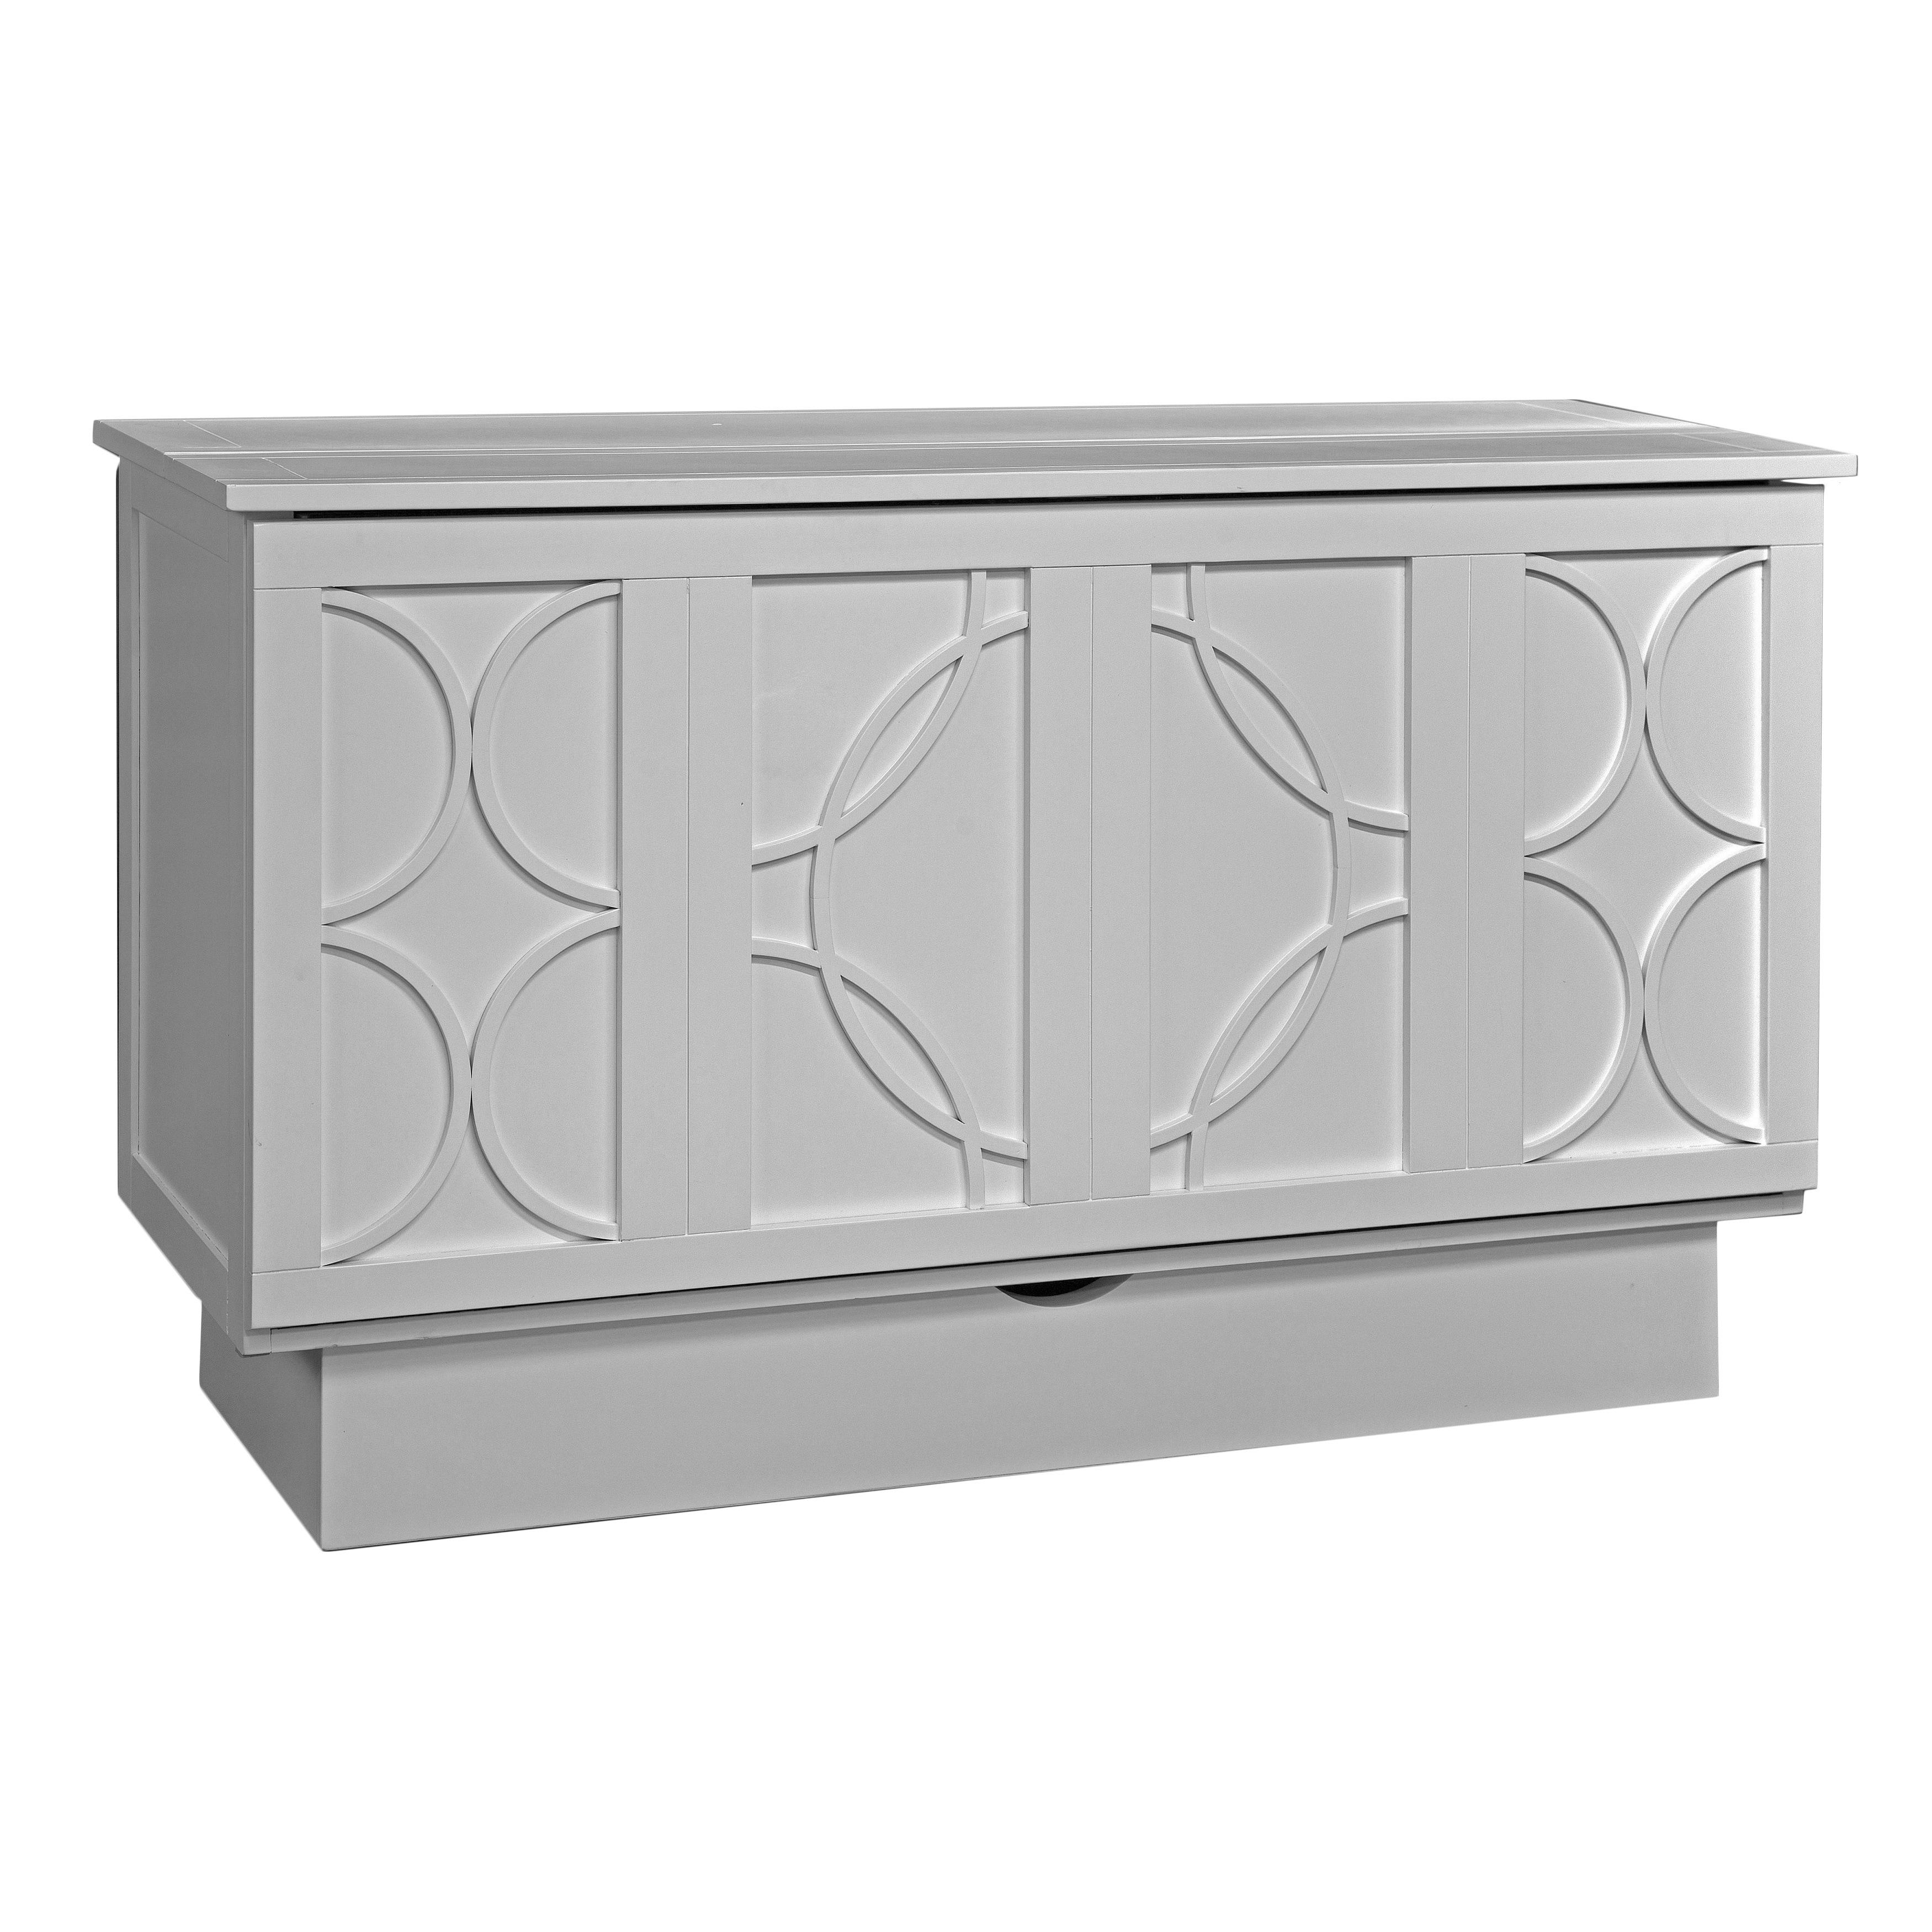 Bristol White Cabinet Bed with Mattress (White), Size Queen